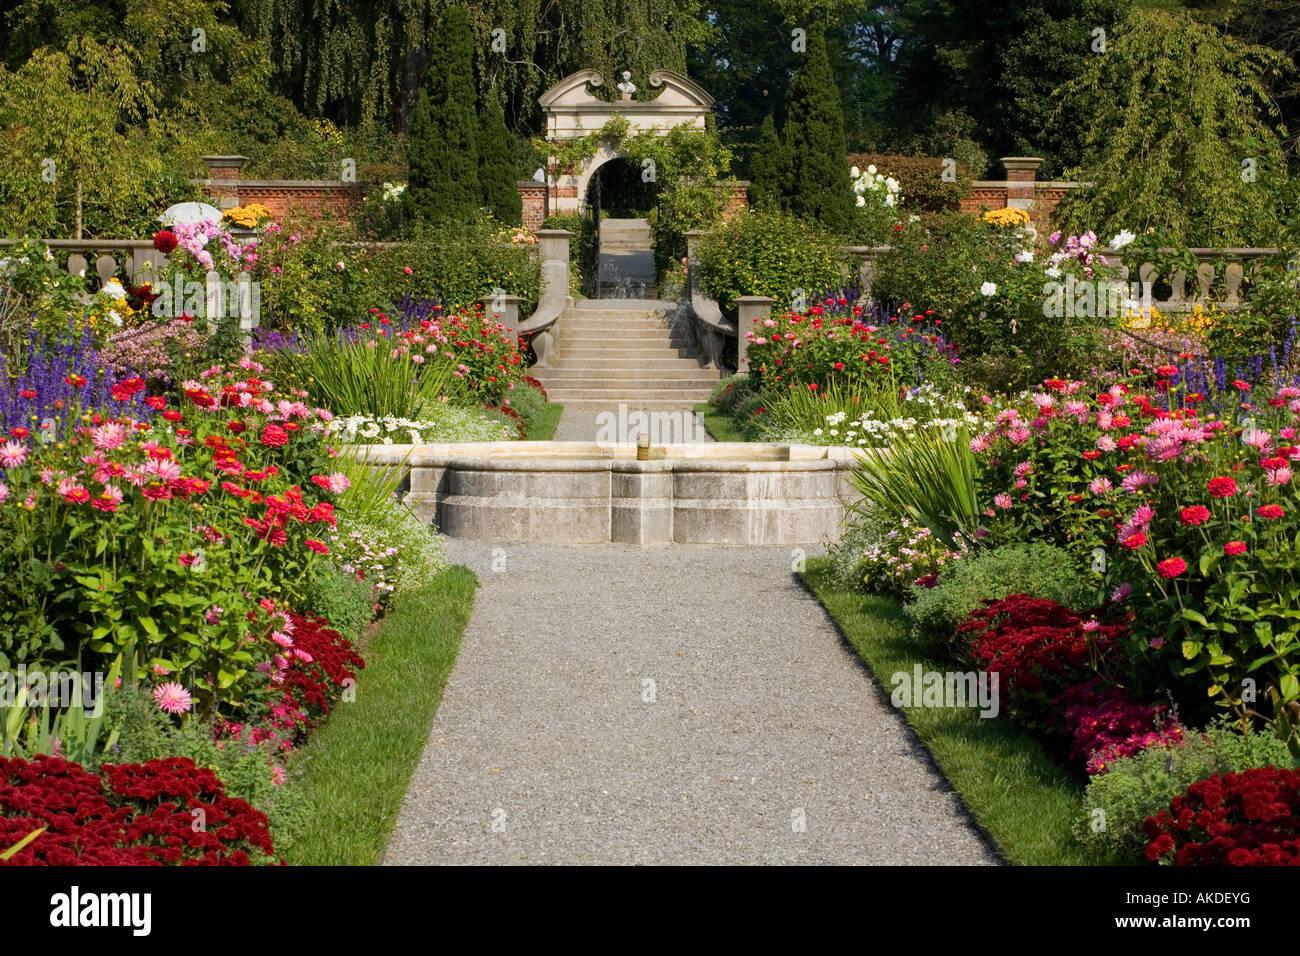 Old Westbury Gardens finest English garden in USA Nassau County Long Island New York - Stock Image